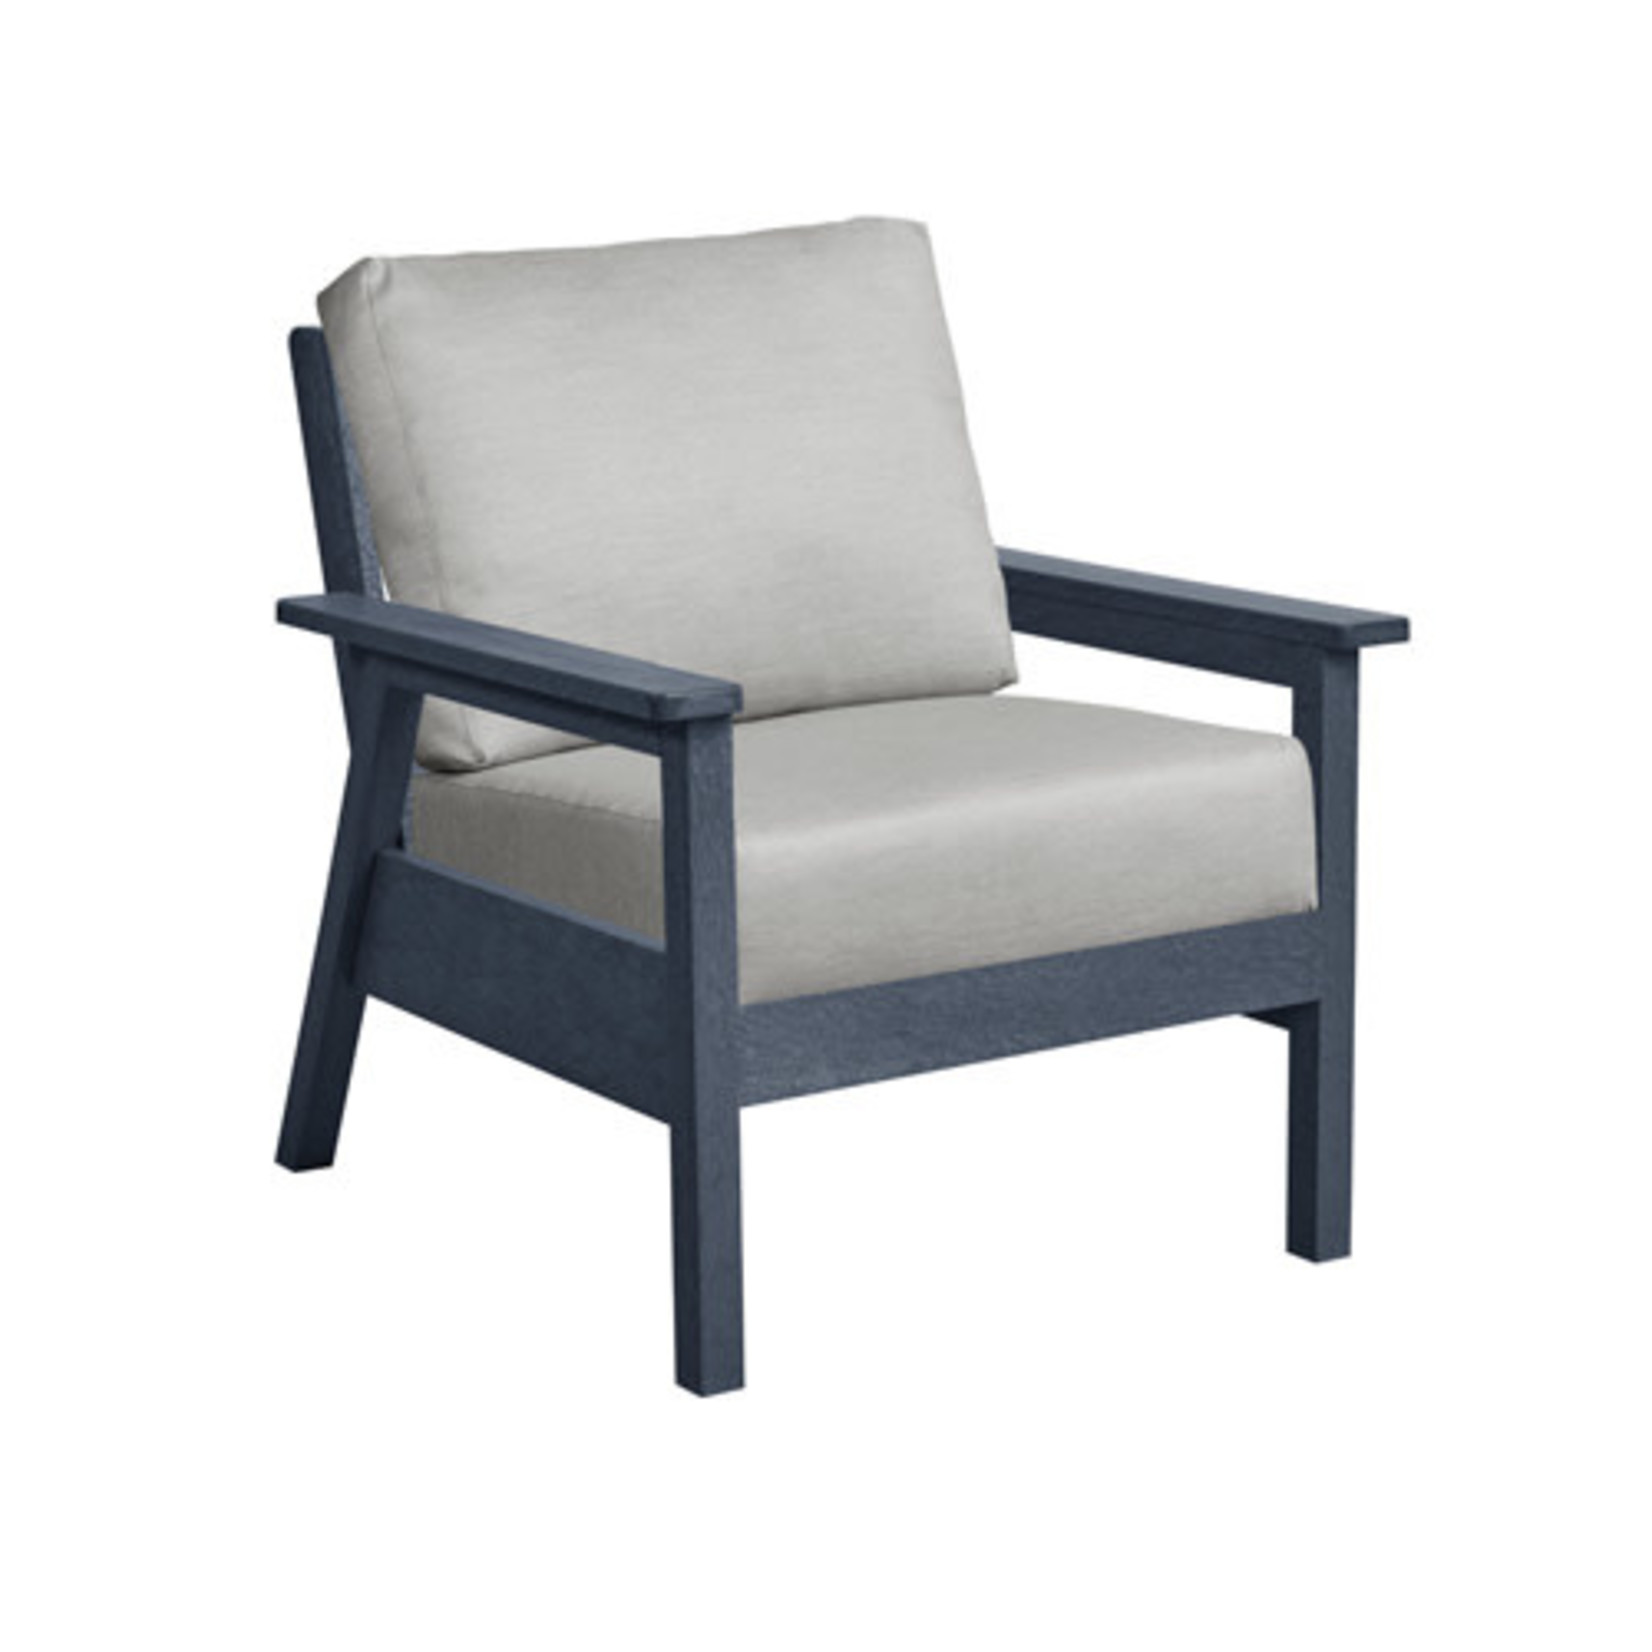 Tofino Slate Outdoor Chair